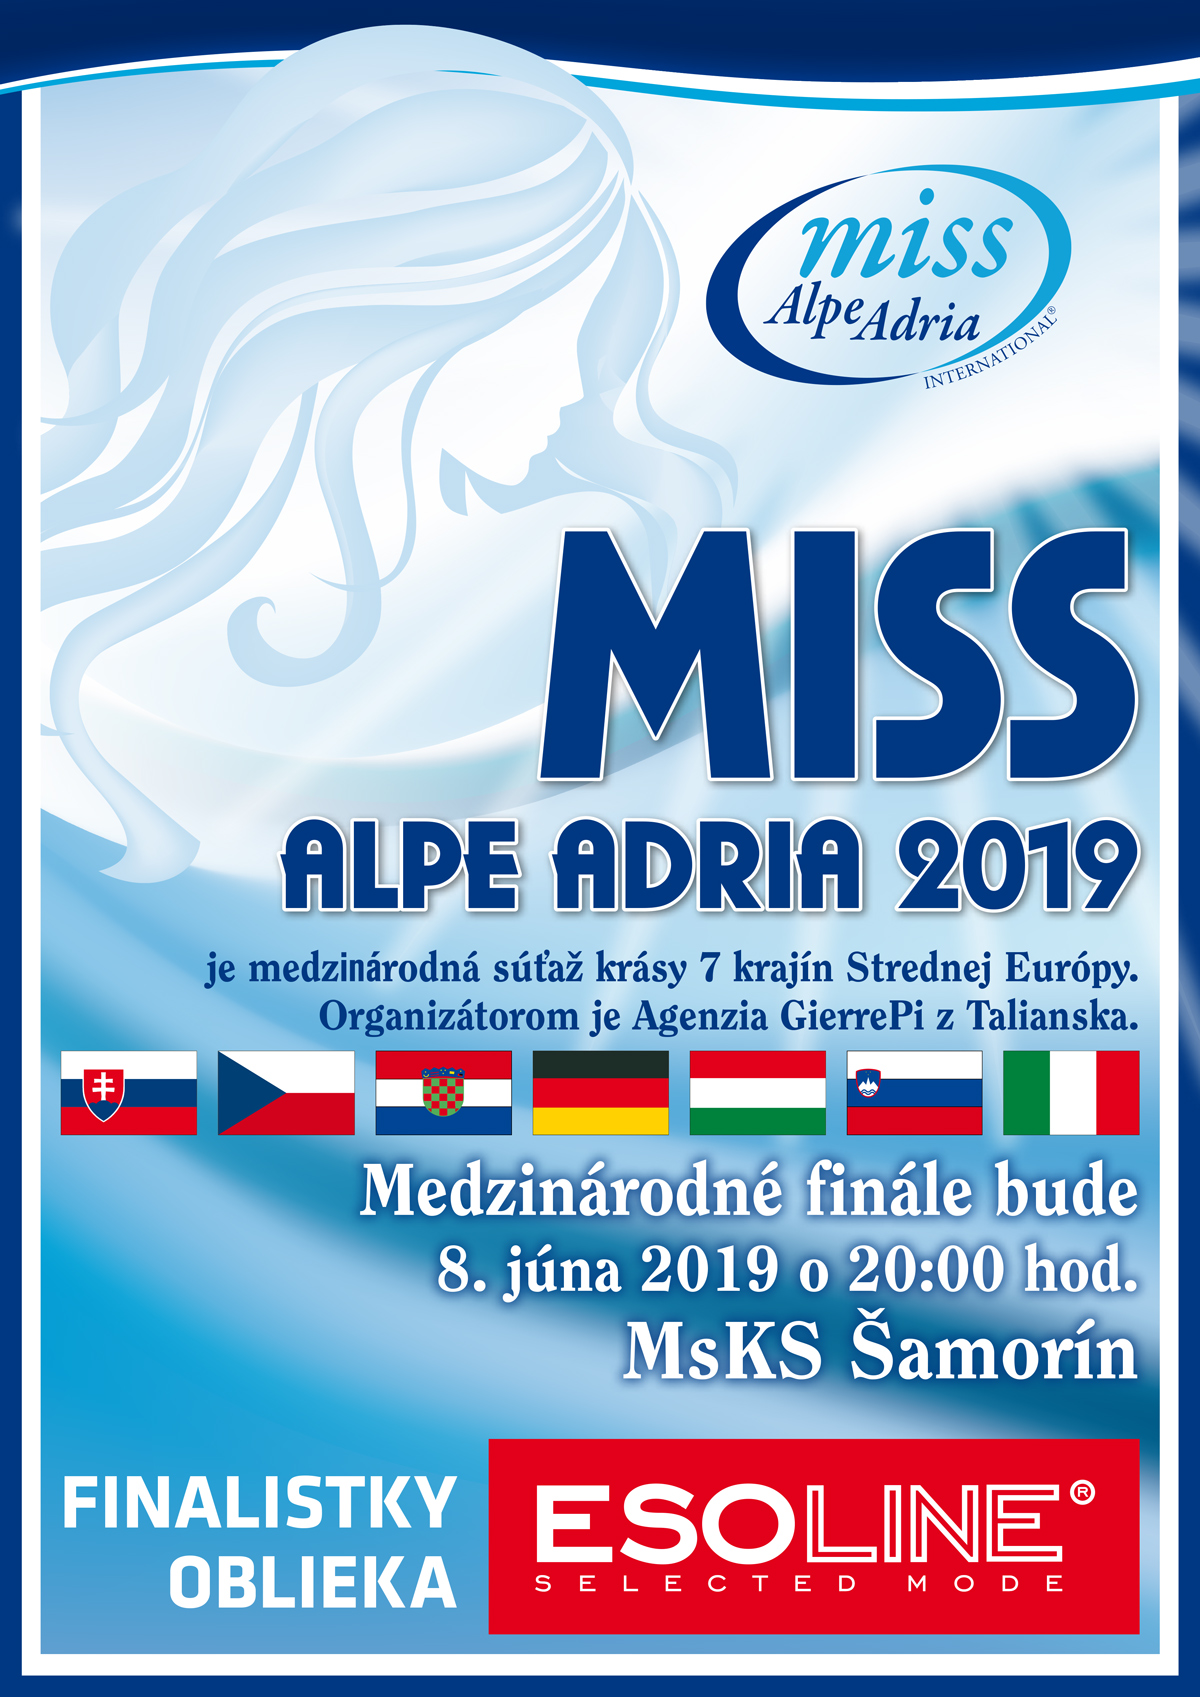 MISS ALPE ADRIA 2019 - ESOLINE